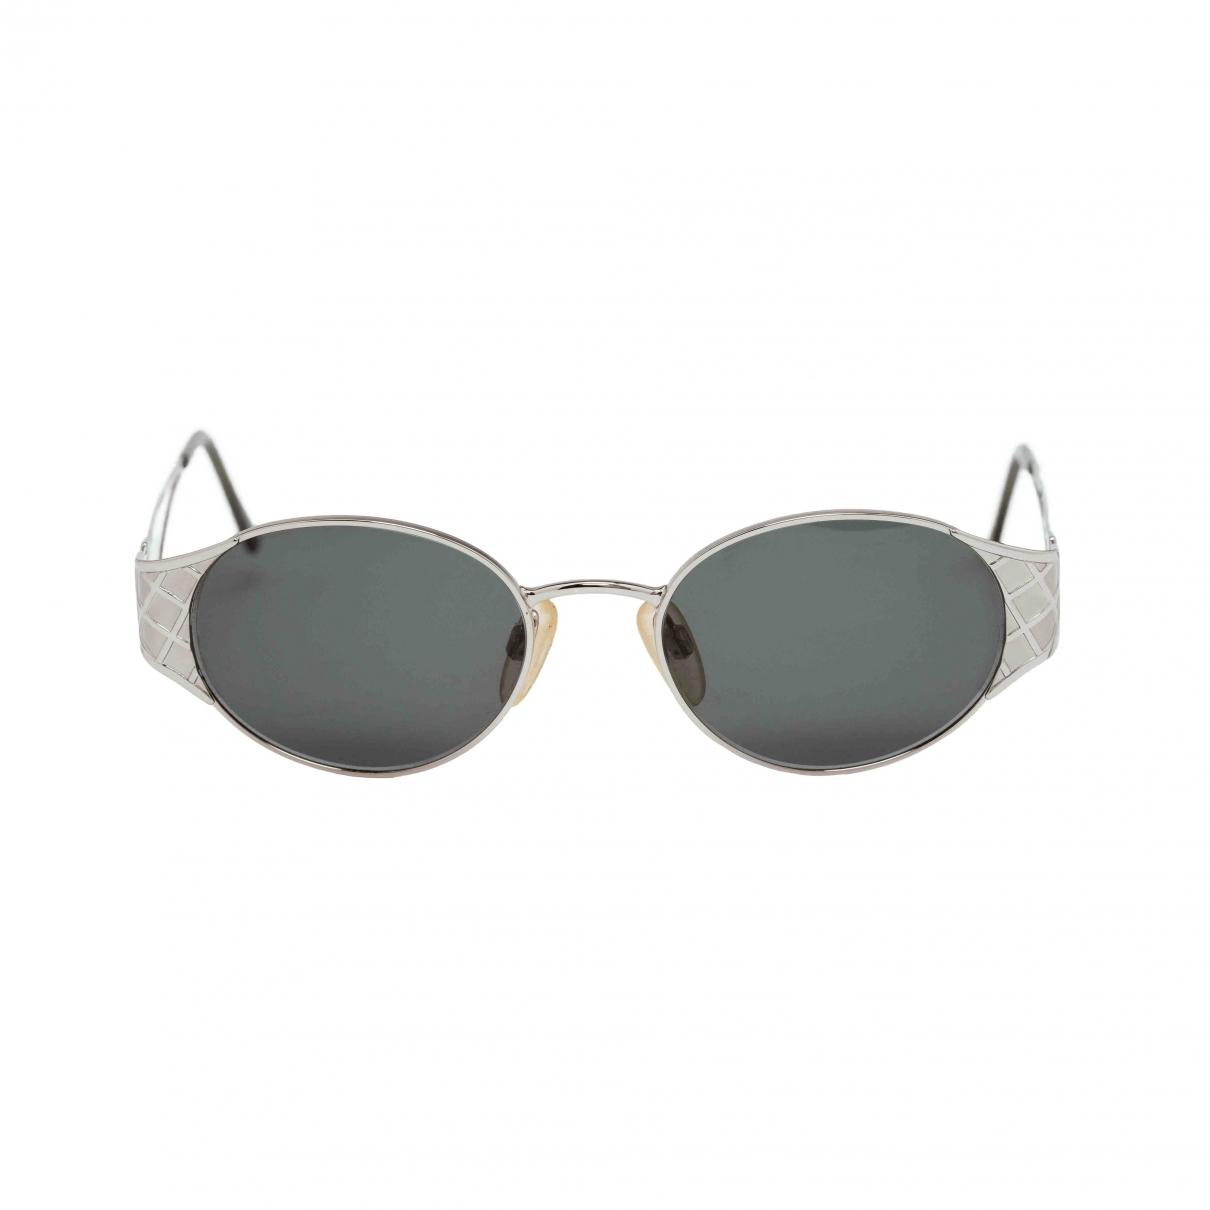 Yves Saint Laurent \N Sonnenbrillen in  Silber Metall